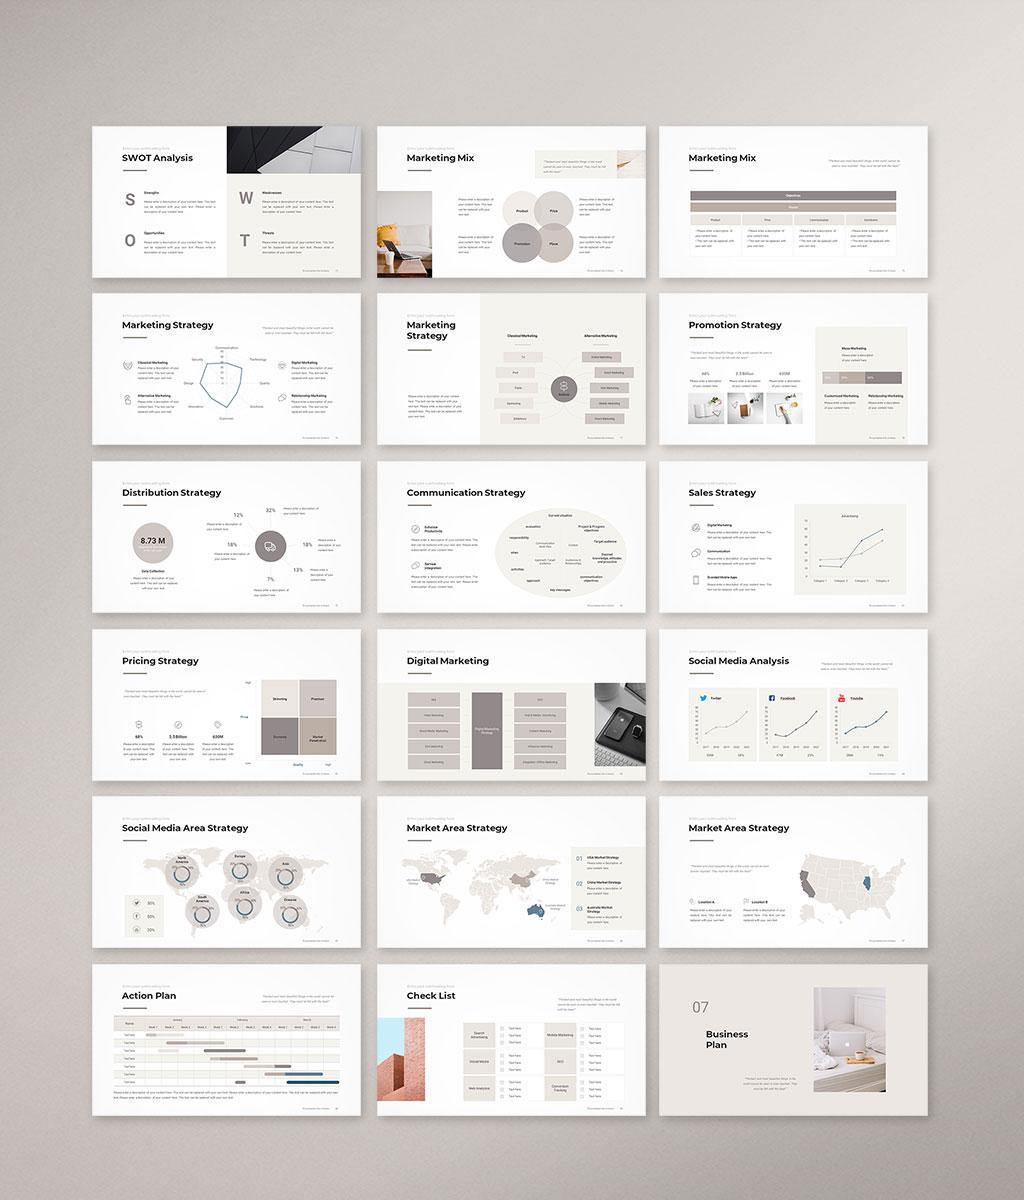 Business Plan PowerPoint Template 005